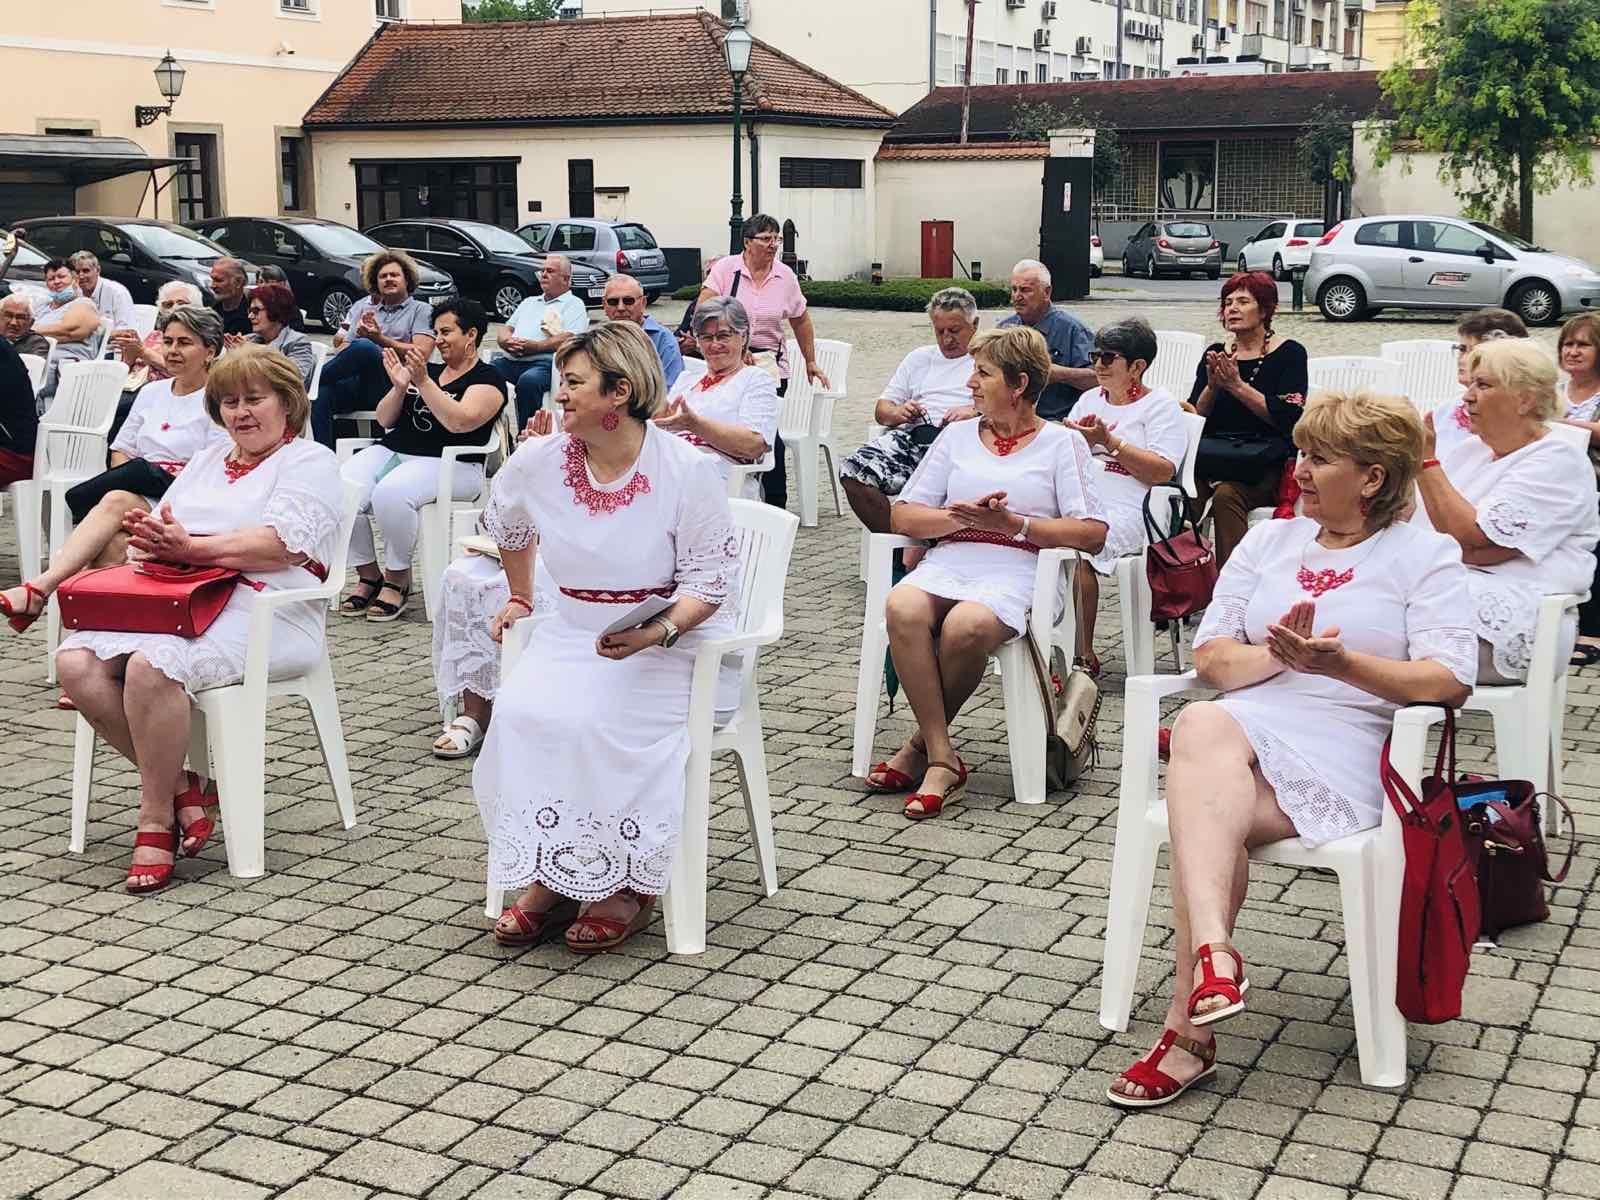 grad bjelovar najava projekta 7